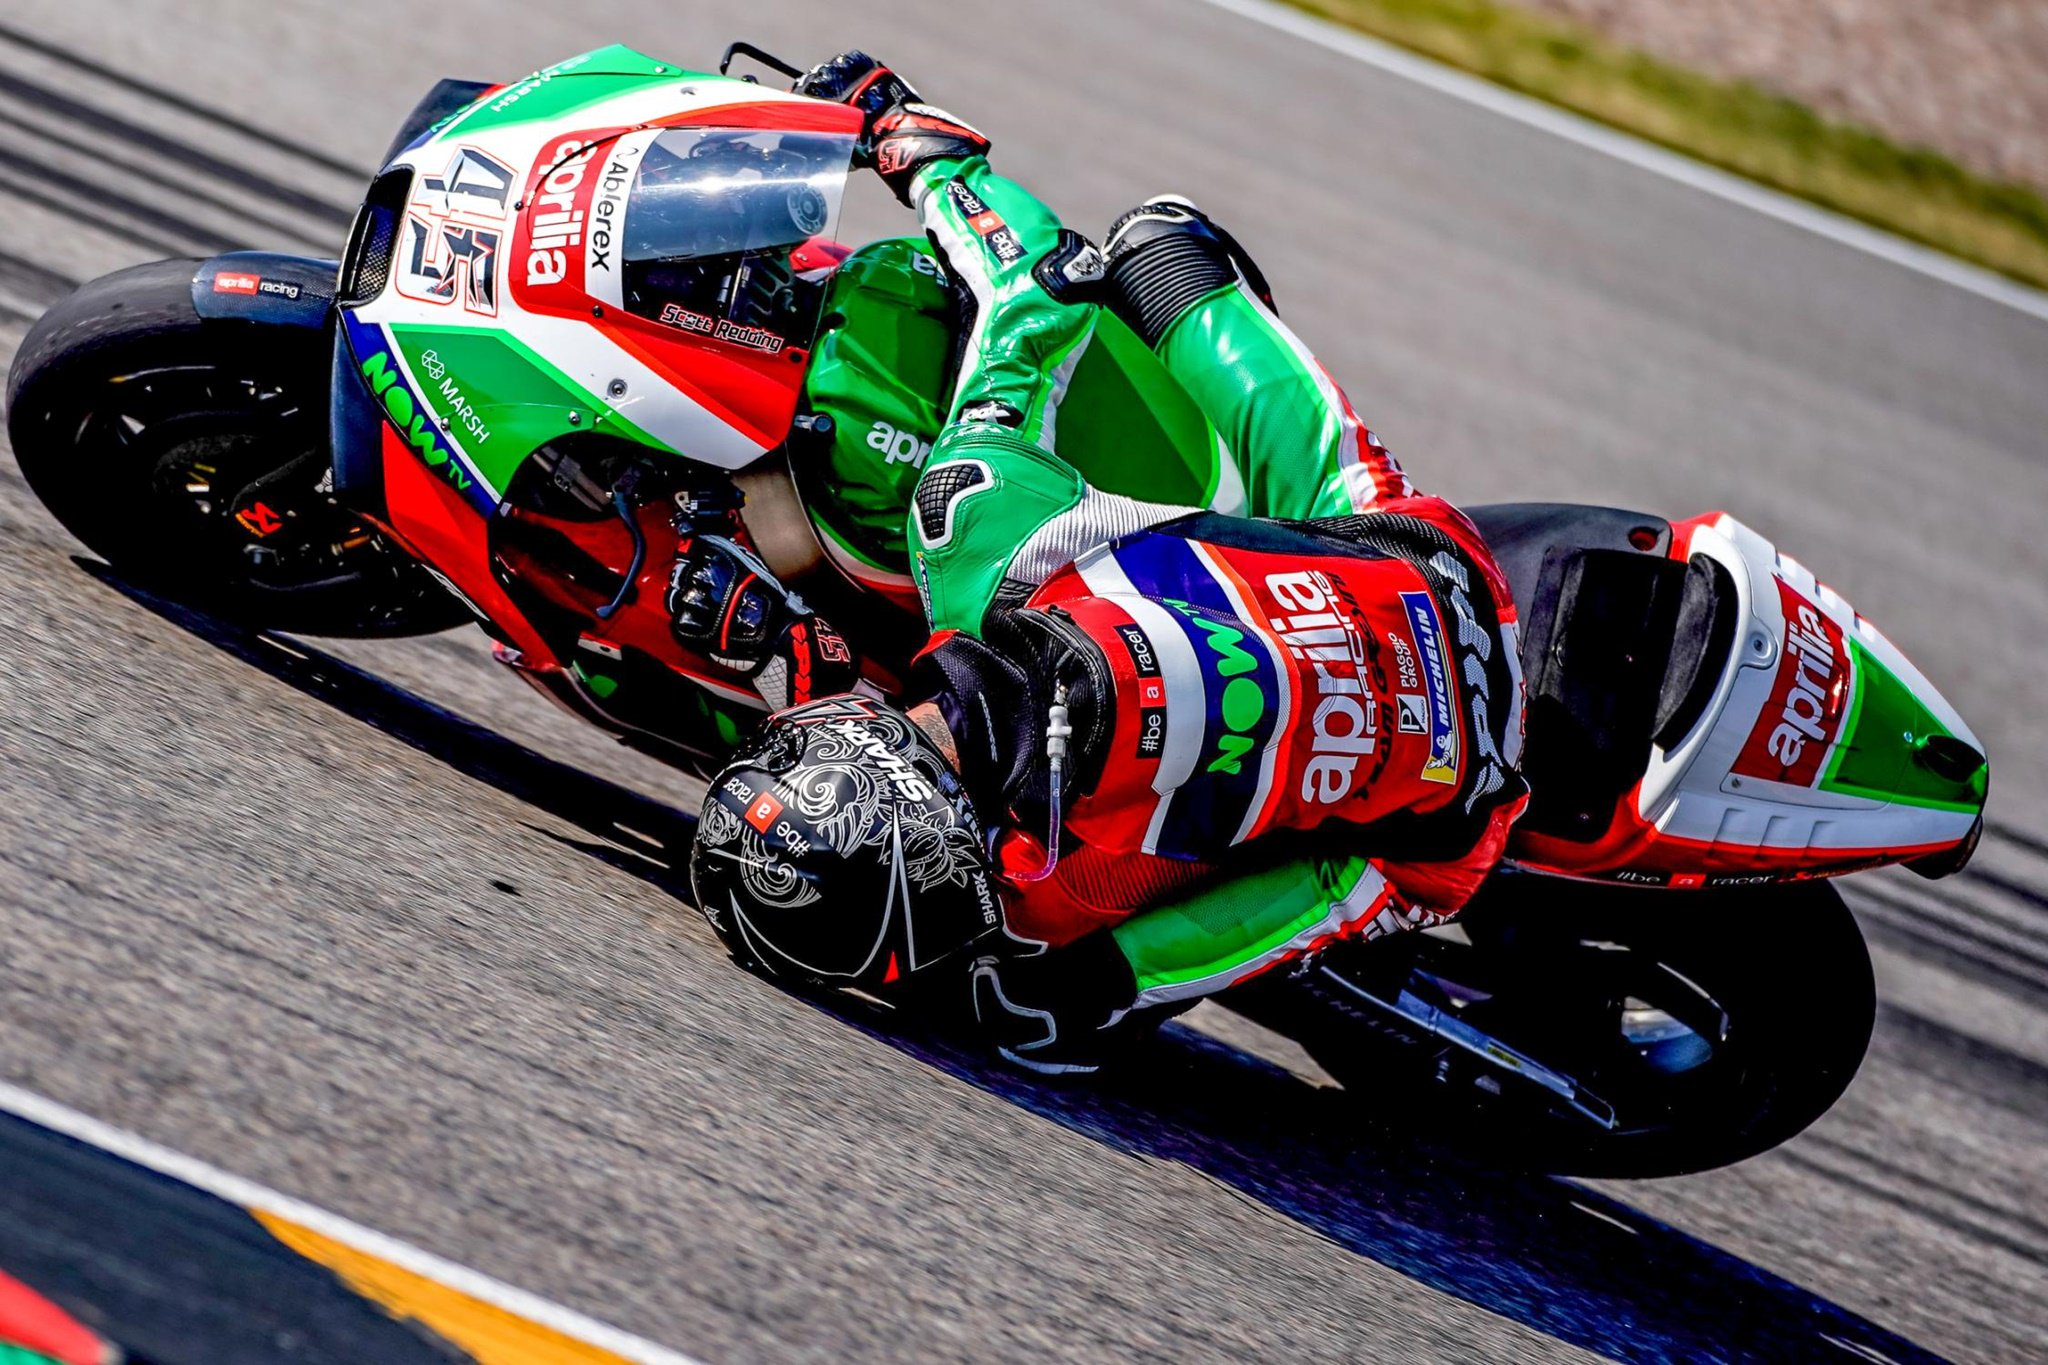 4361975_MotoGP18_GermanGP_2018_Xe_Tinhte-031.jpg